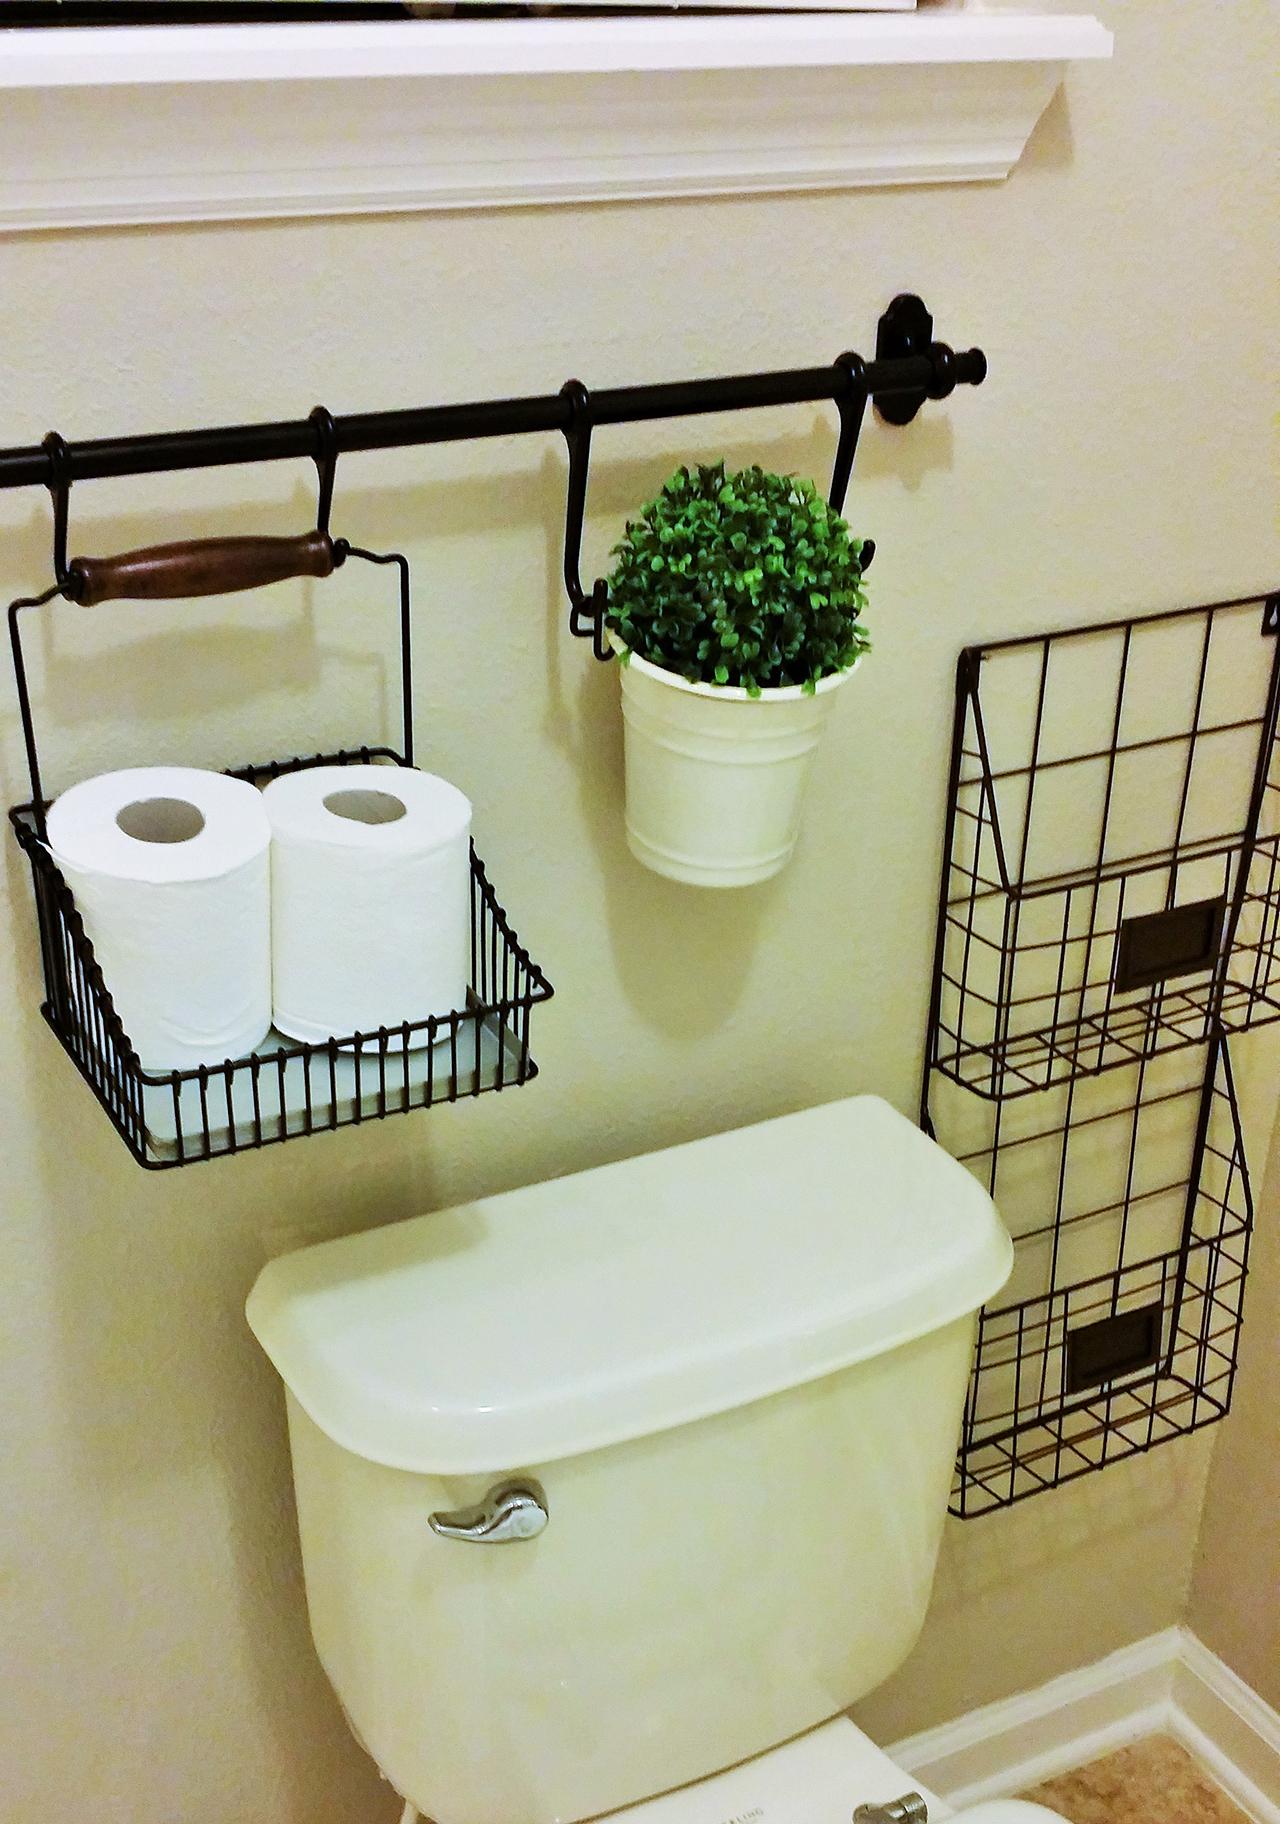 Portarrollos papiel higienico 19